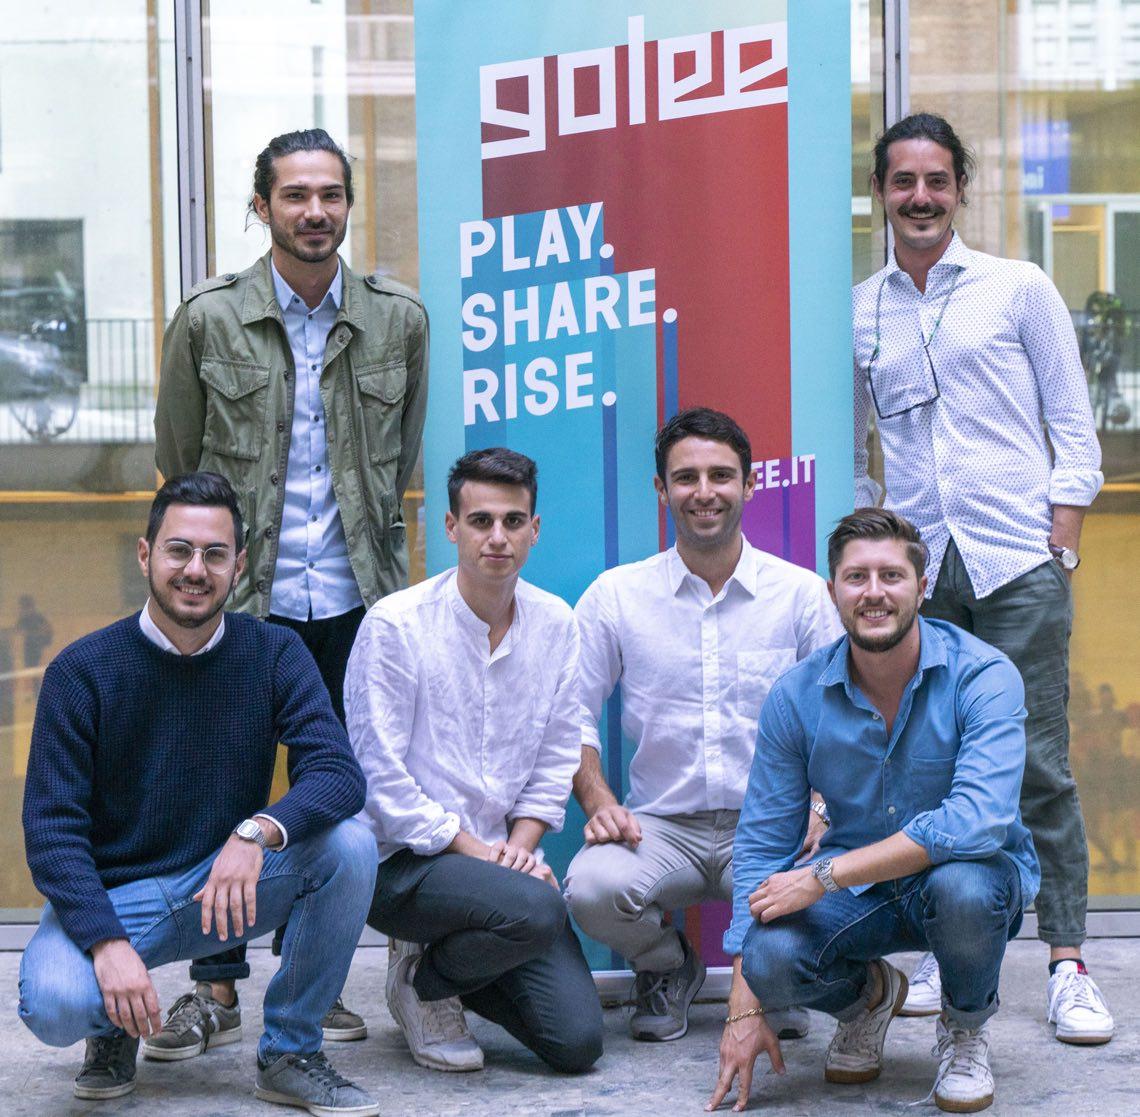 Team Golee